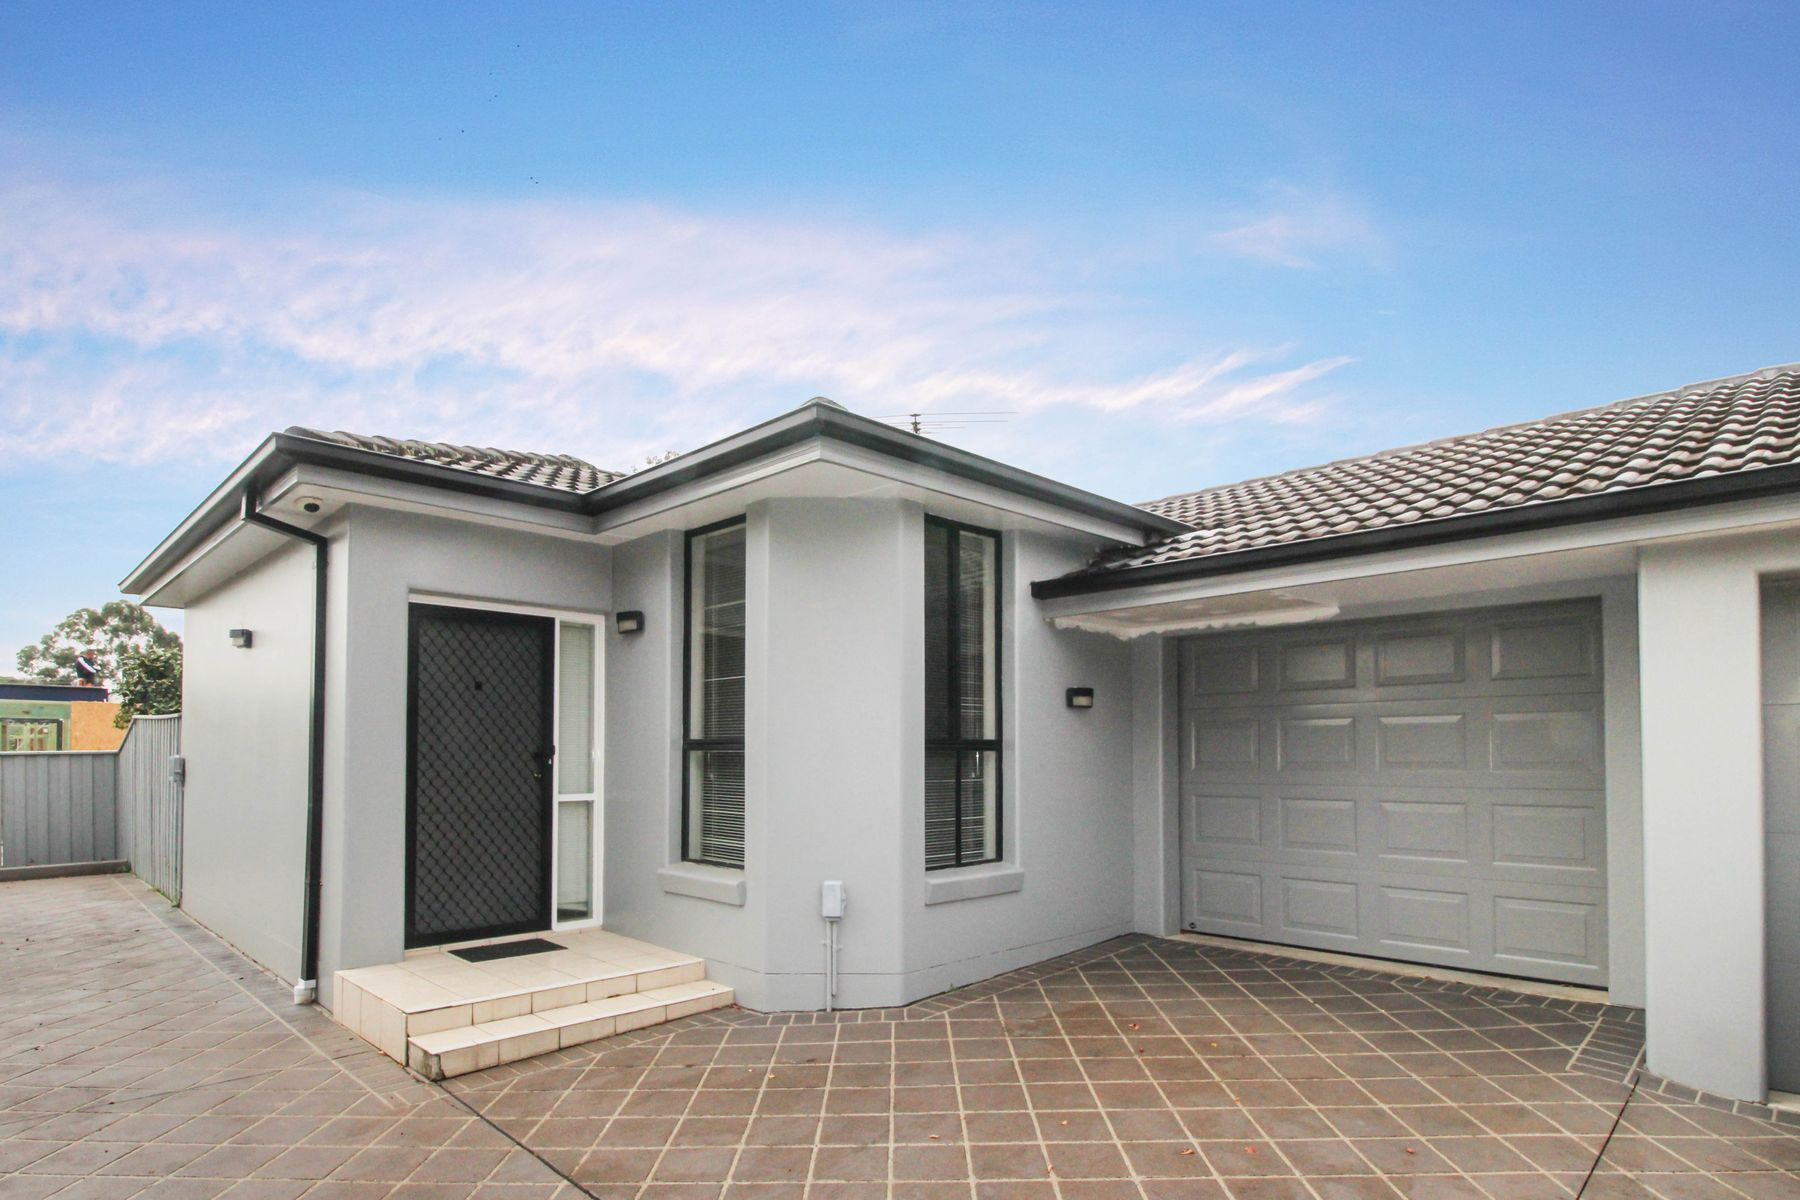 3/43 Trevitt Road, North Ryde, NSW 2113